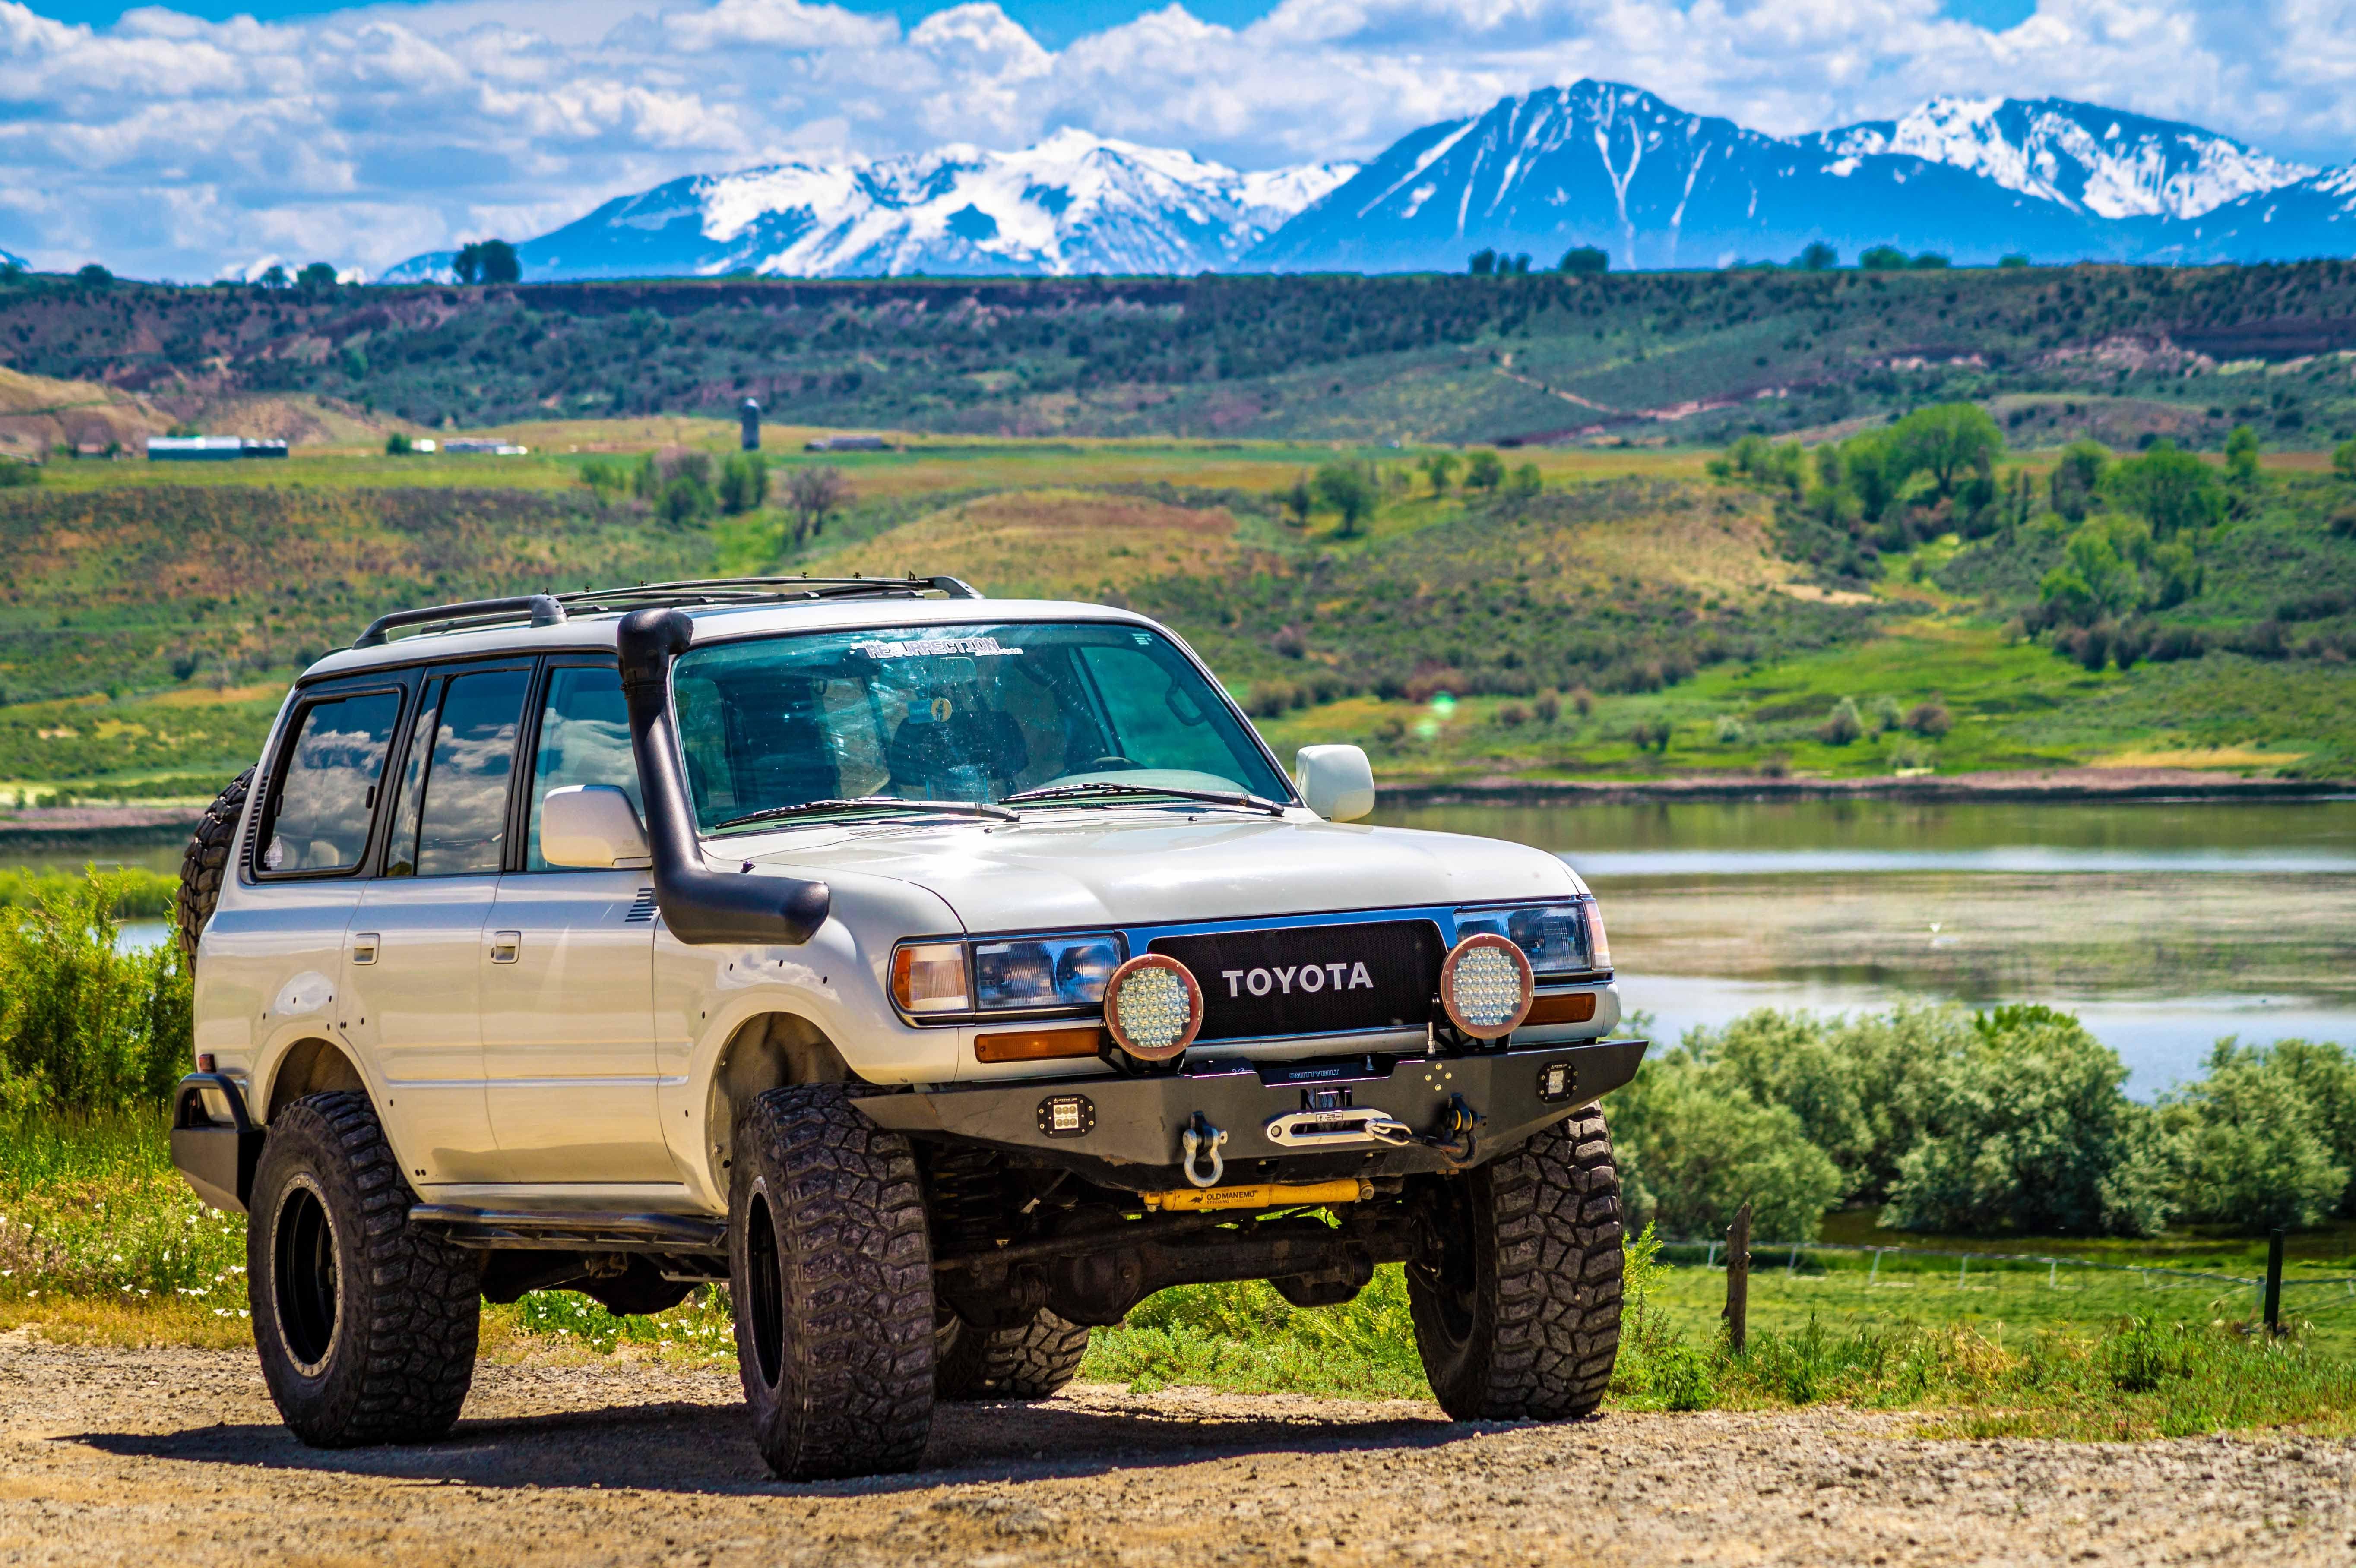 Kekurangan Toyota 80 Perbandingan Harga